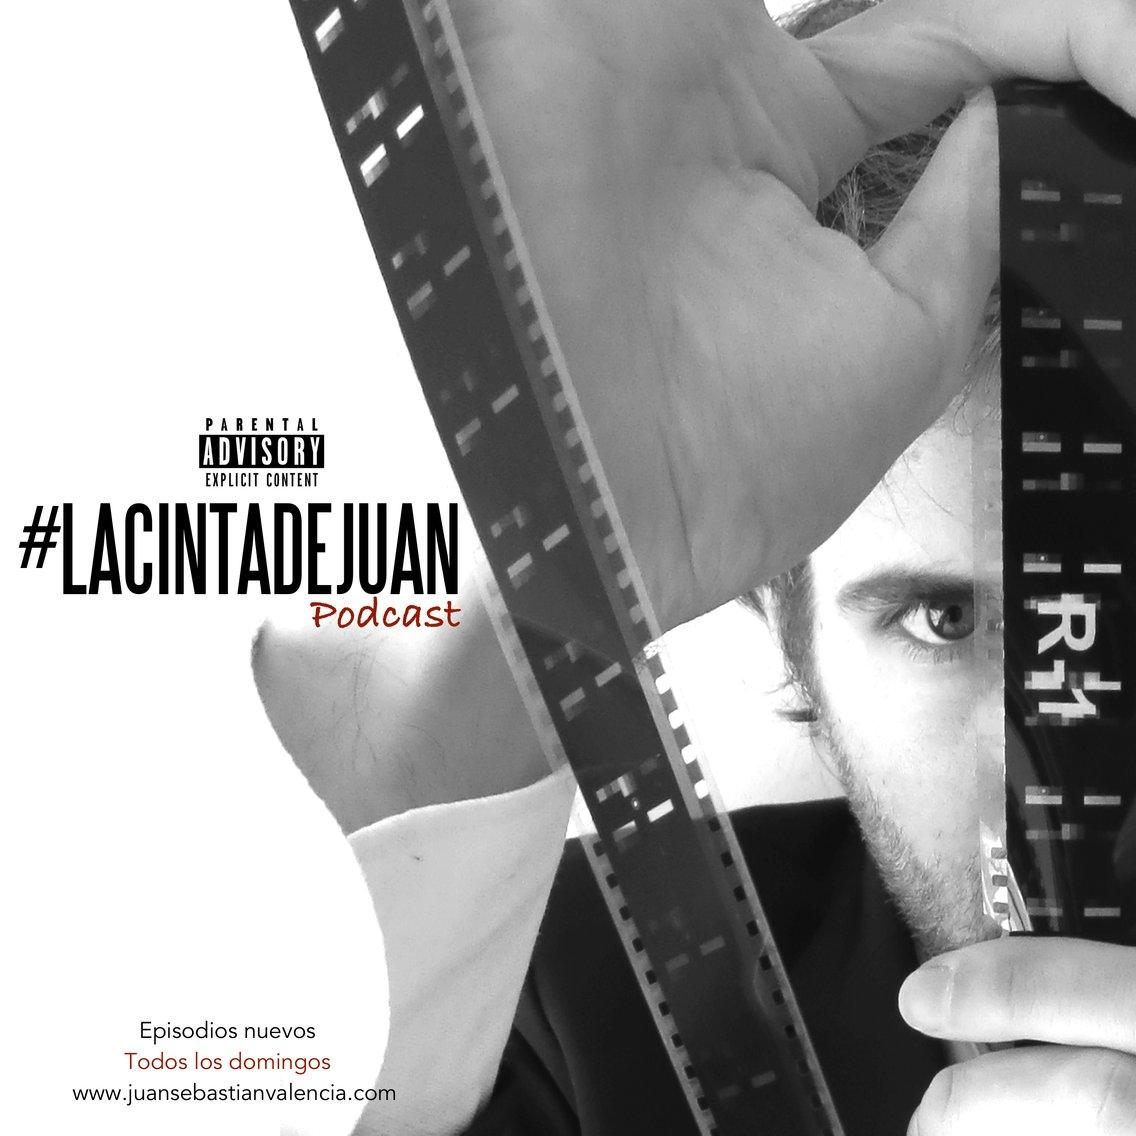 La Cinta de Juan - Cover Image